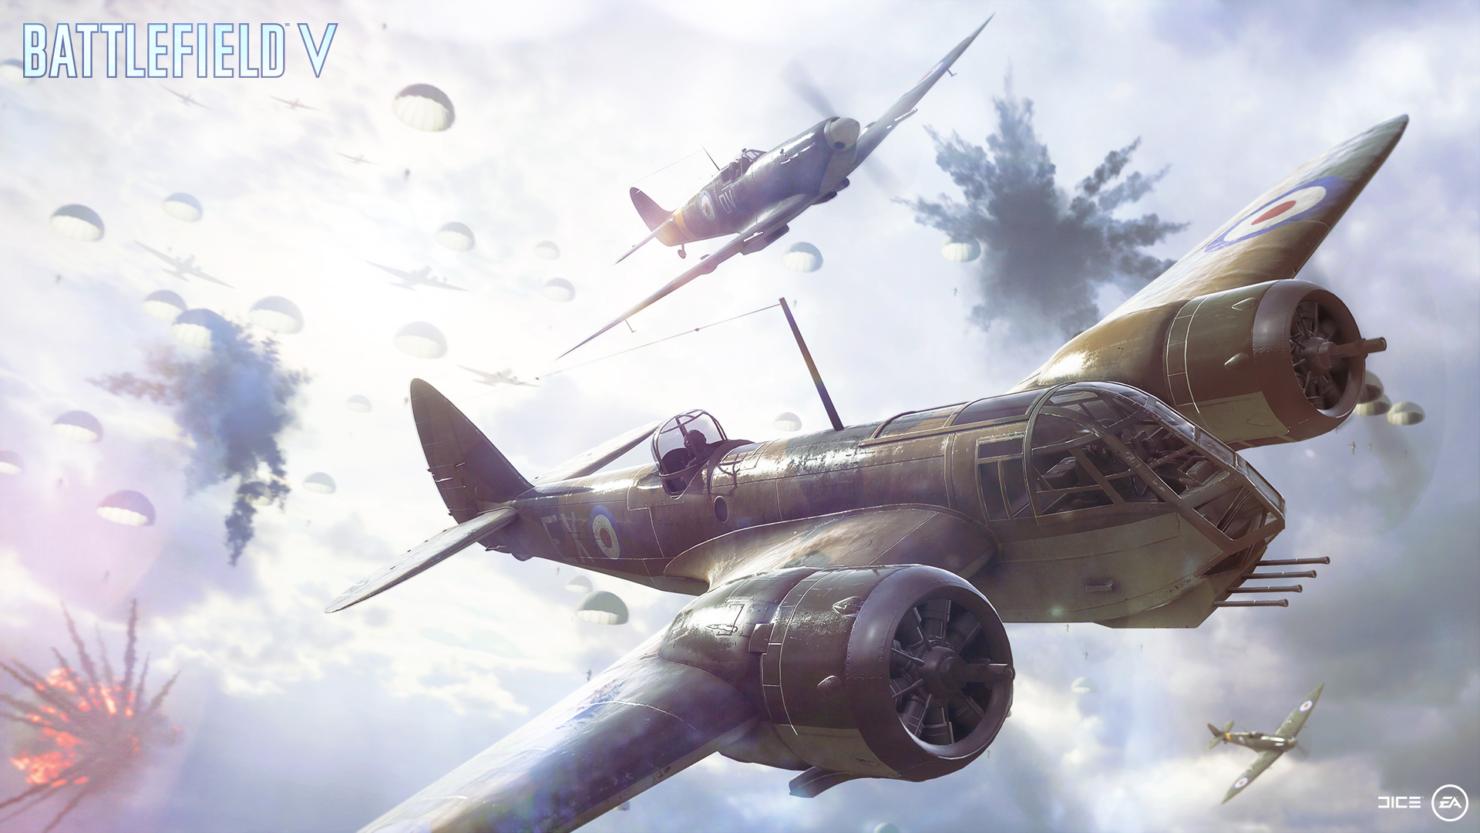 battlefield-v-reveal-screenshot-008